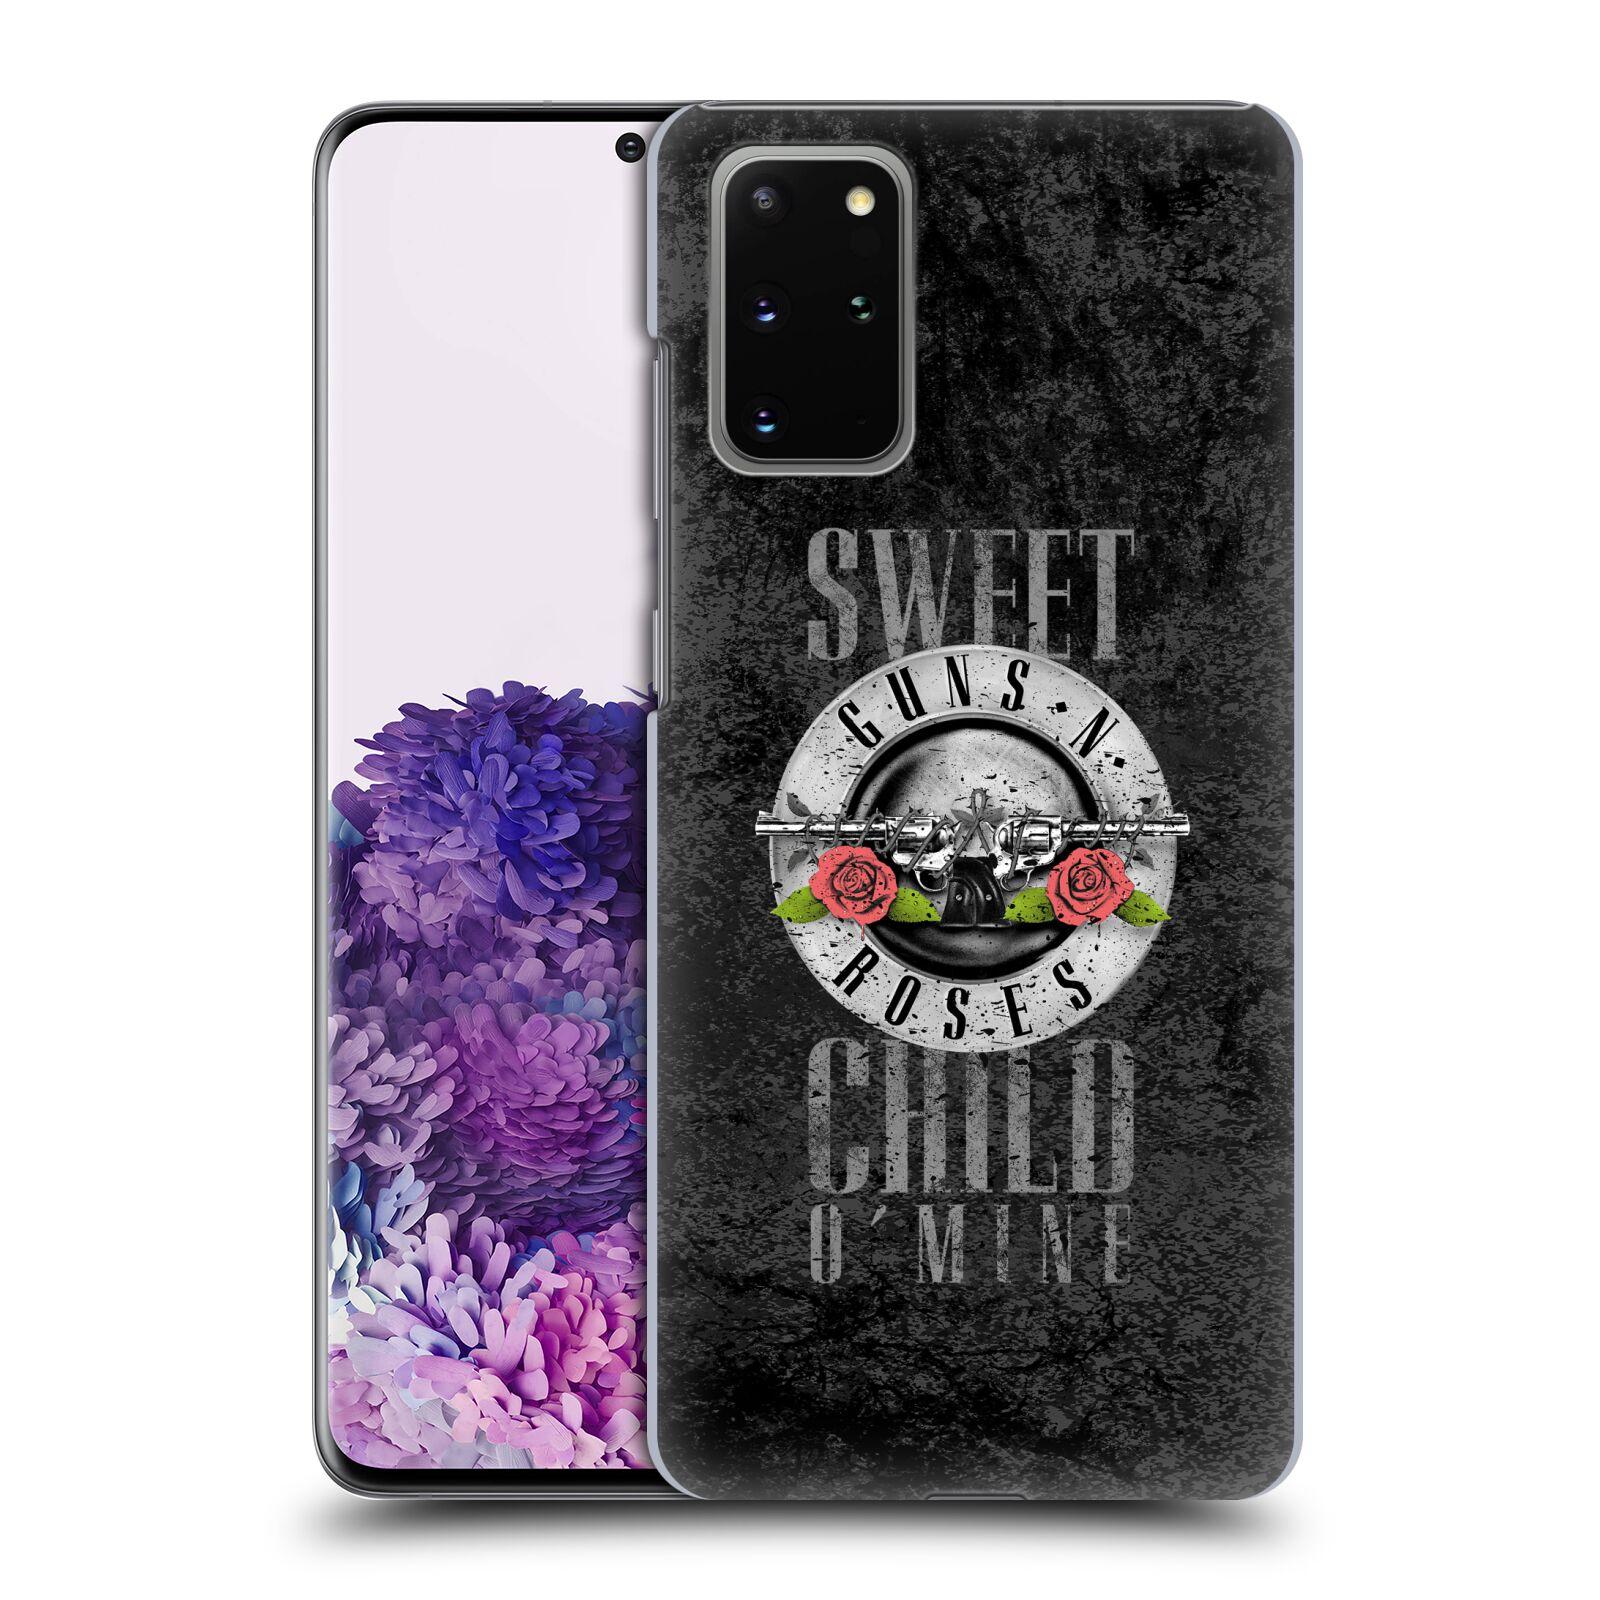 Plastové pouzdro na mobil Samsung Galaxy S20 Plus - Head Case - Guns N' Roses - Sweet Child